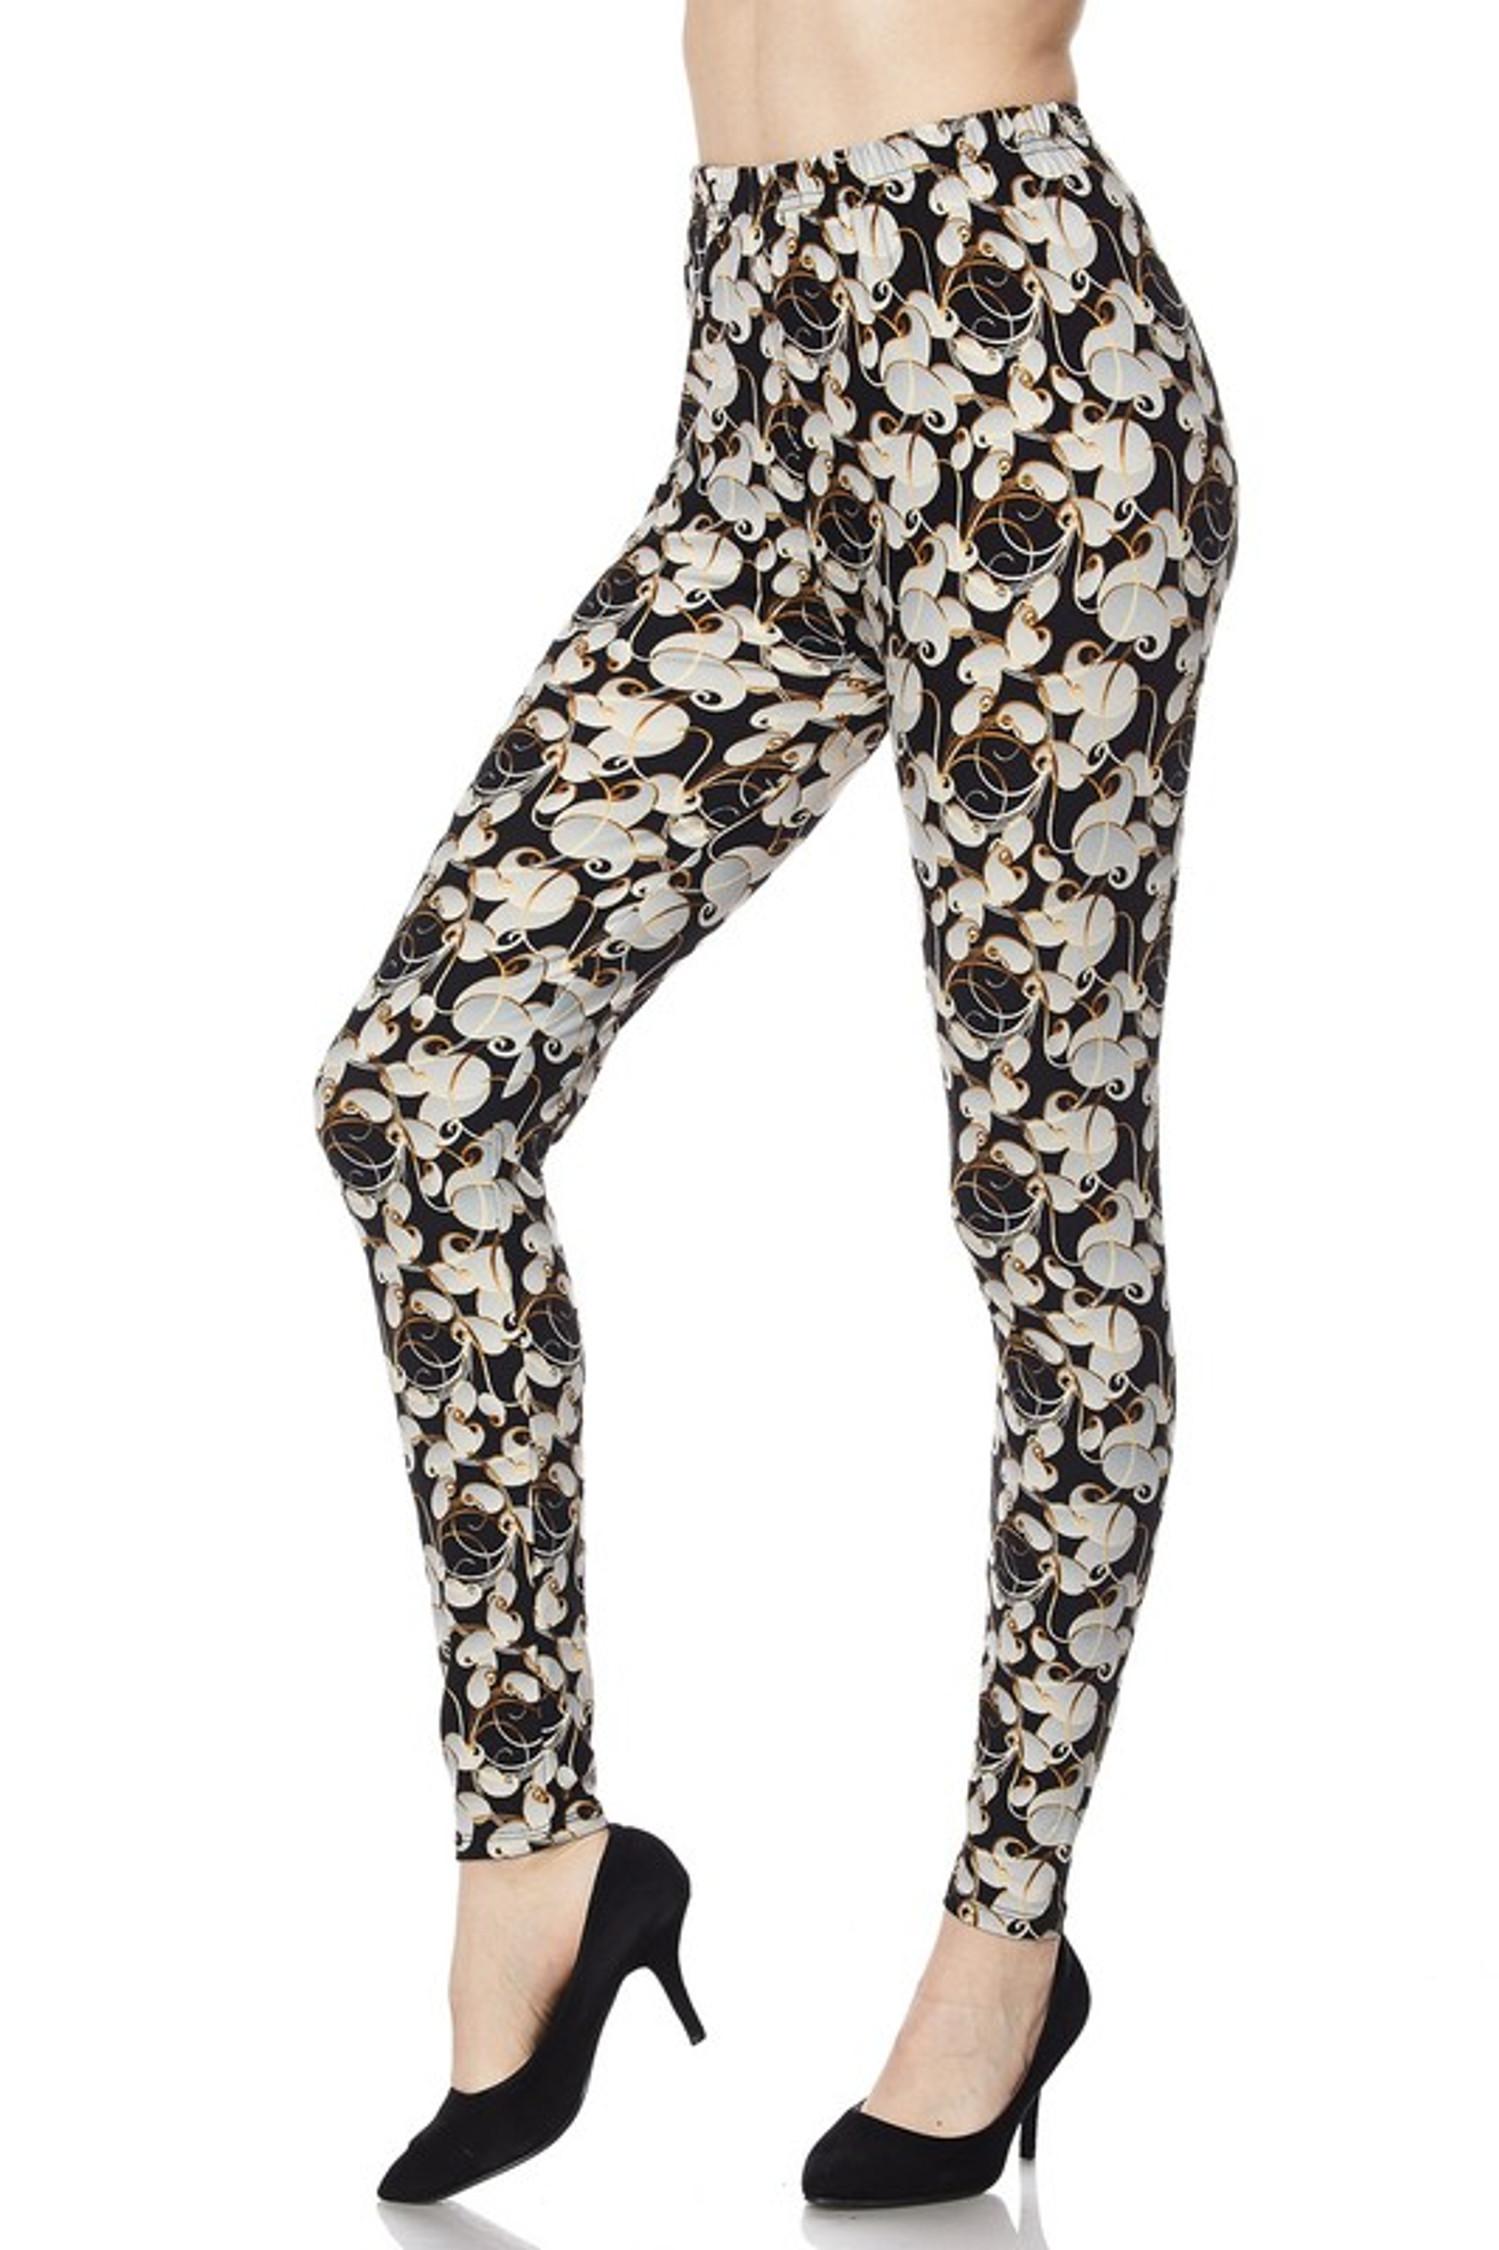 Brushed Ivory Petals Leggings